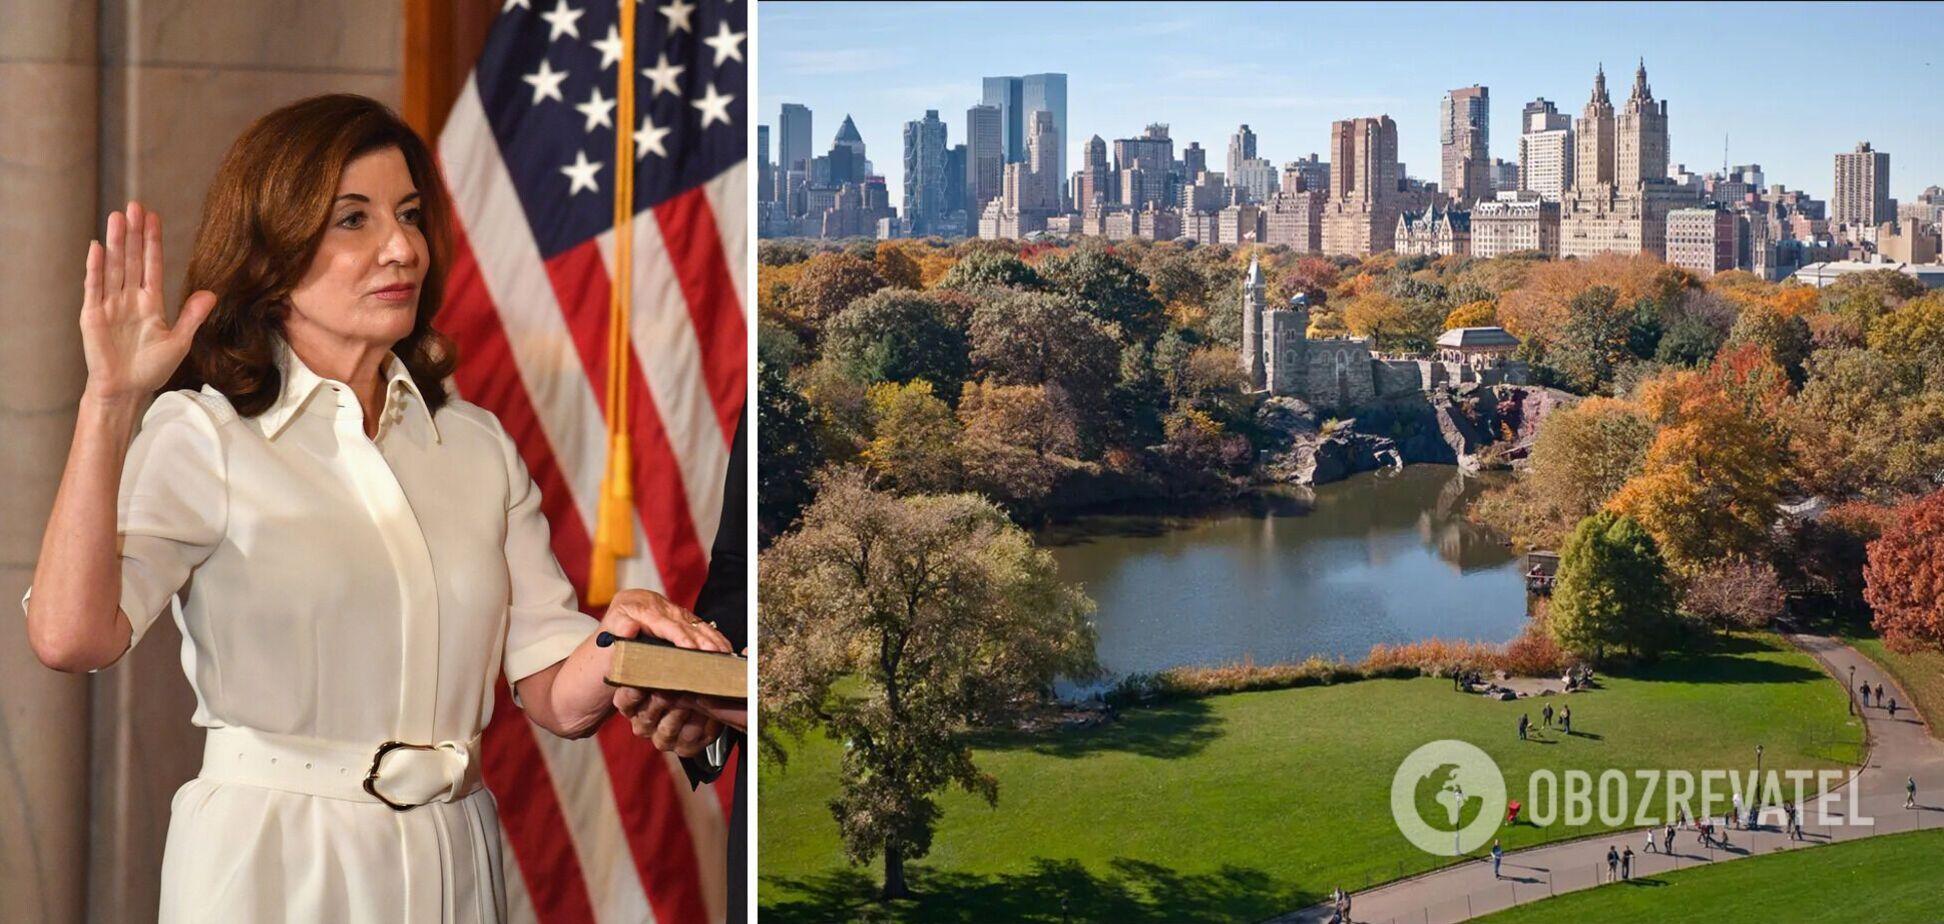 Кеті Хокул стала губернаторкою Нью-Йорка